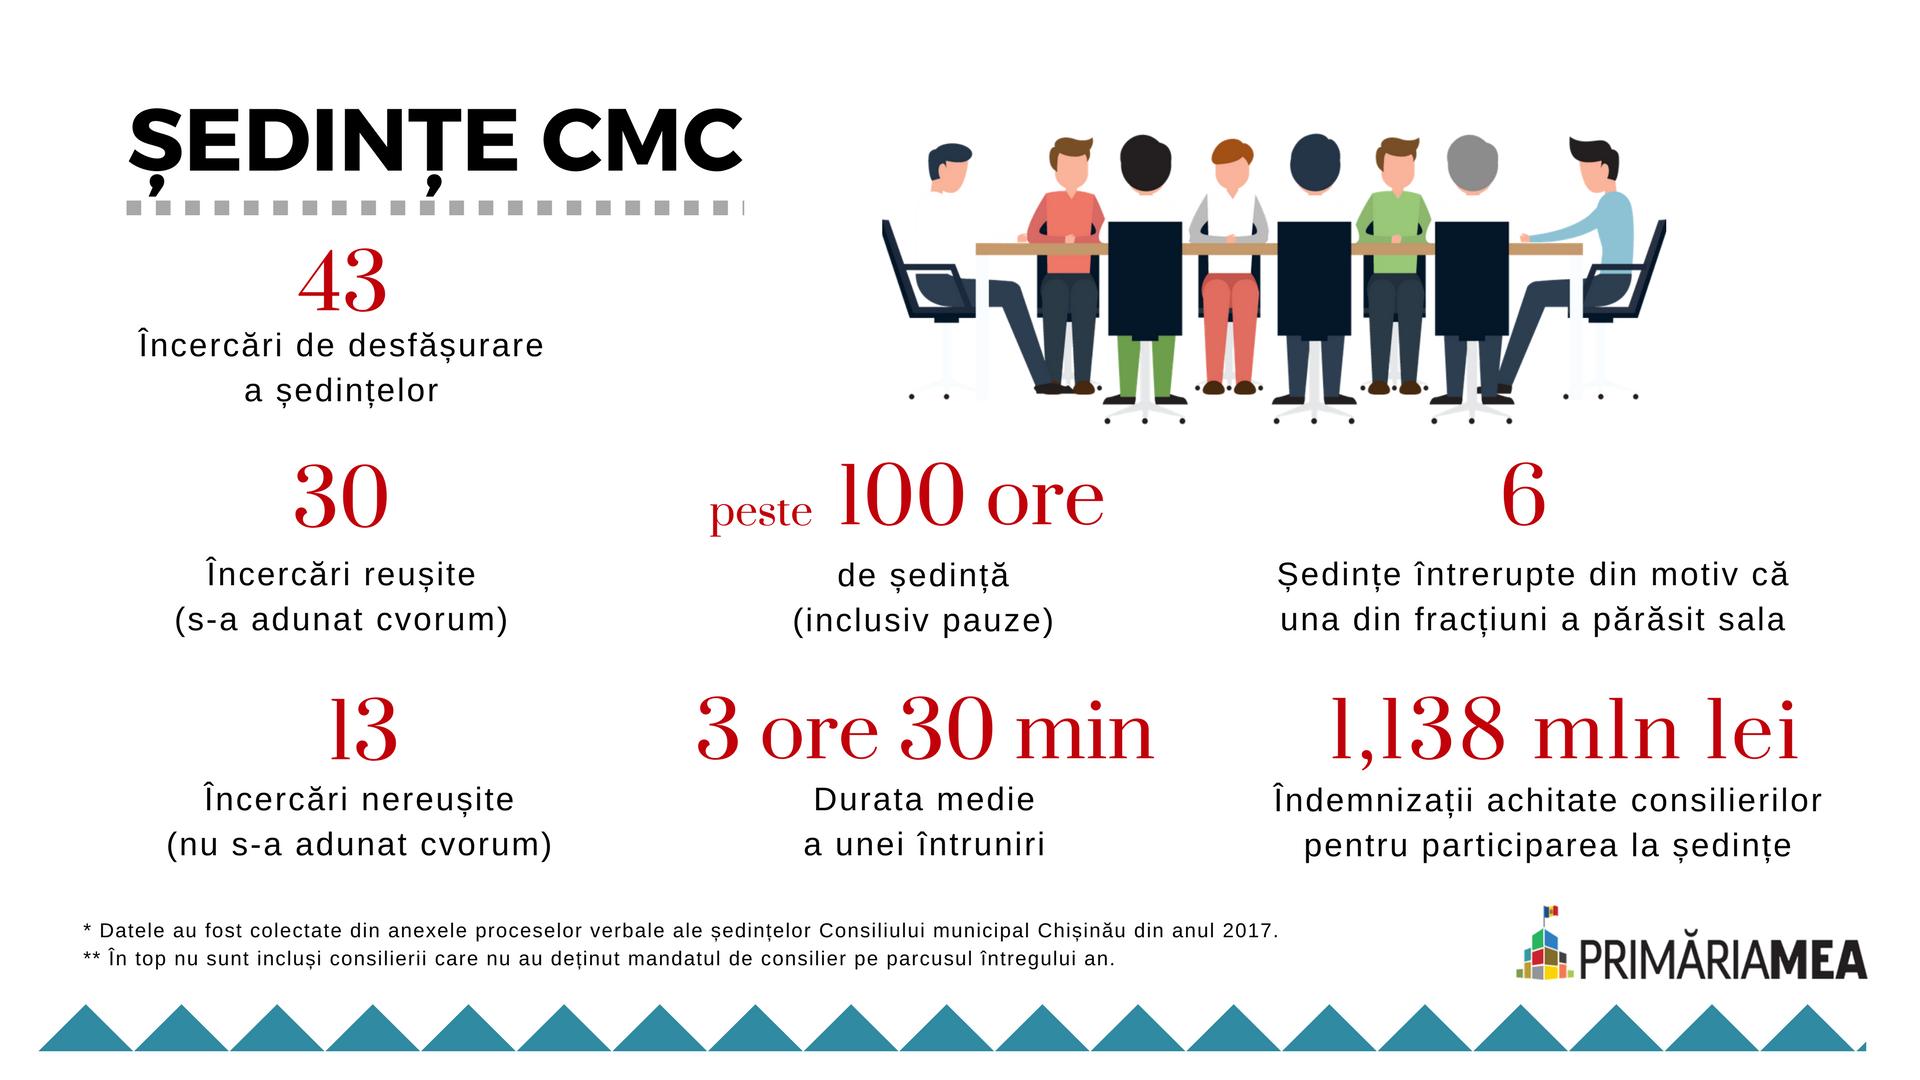 Sedinte CMC